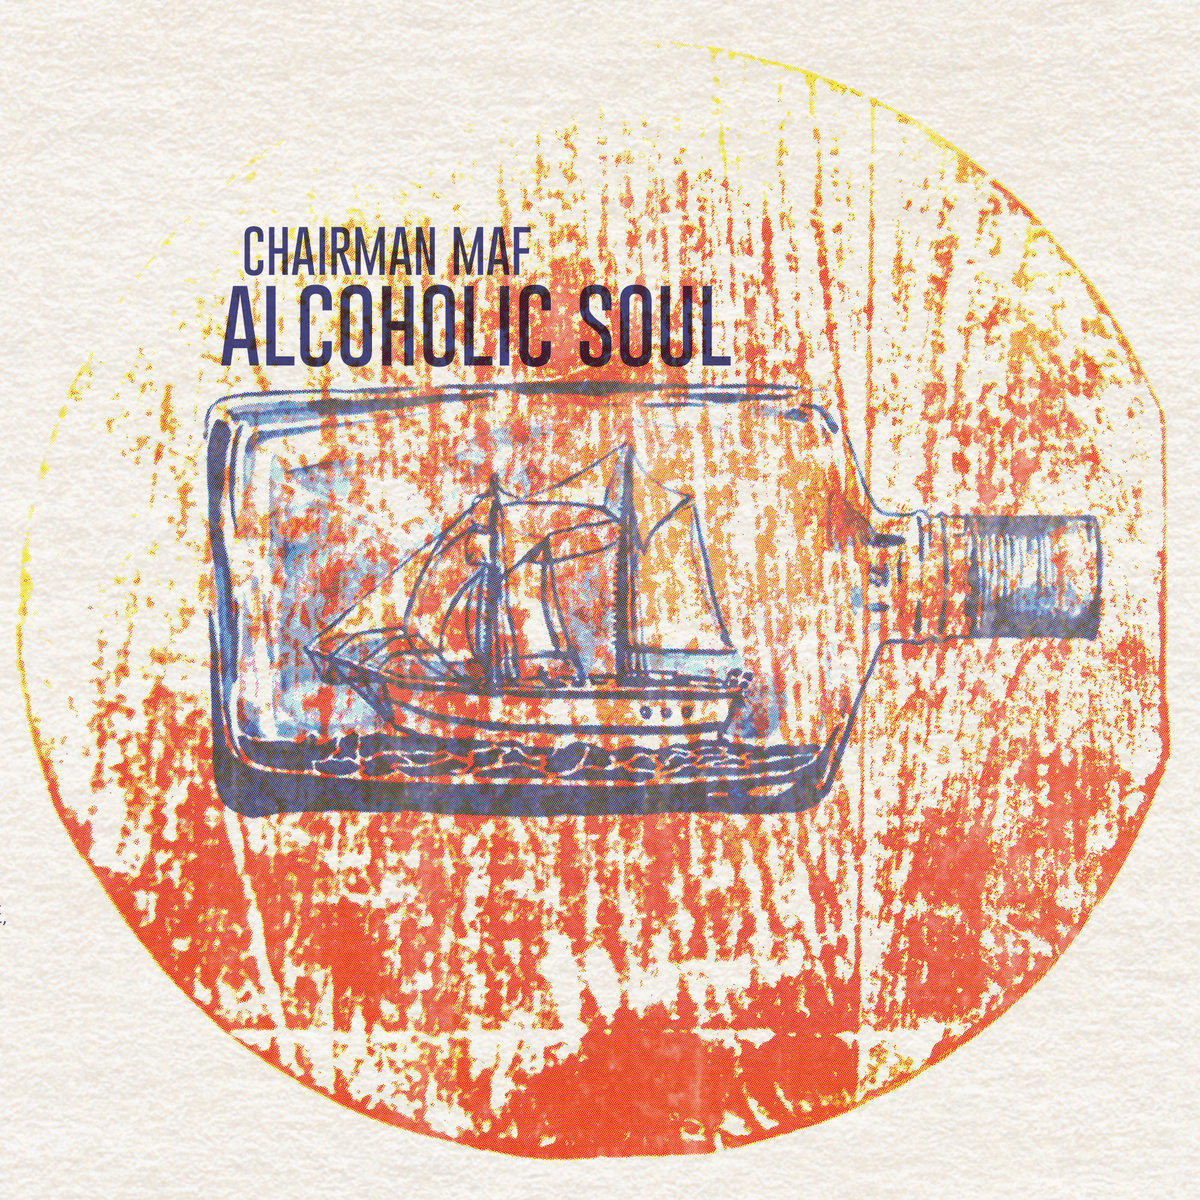 Chairman_maf_presenta__alcoholic_soul_